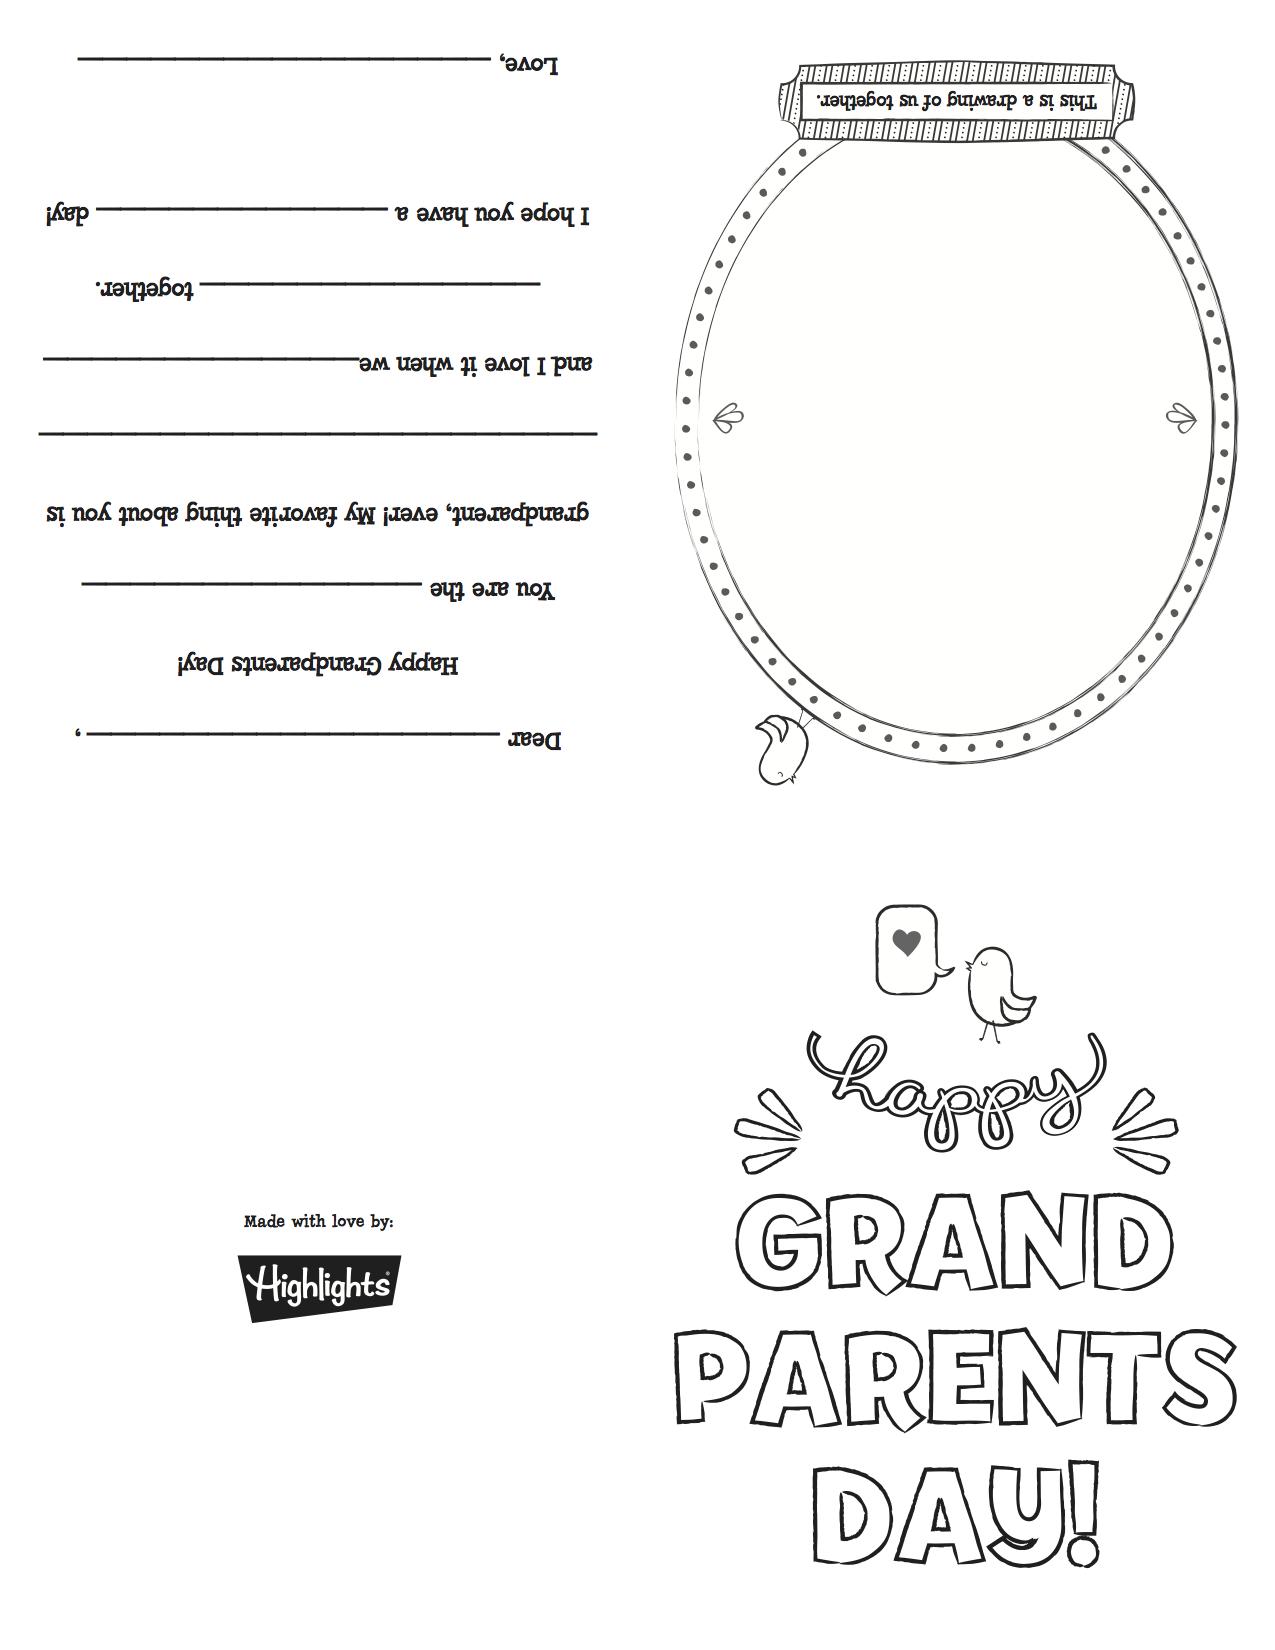 Grandparentsdaycard_Copy | Grandparents Day | Grandparents Day - Grandparents Day Cards Printable Free